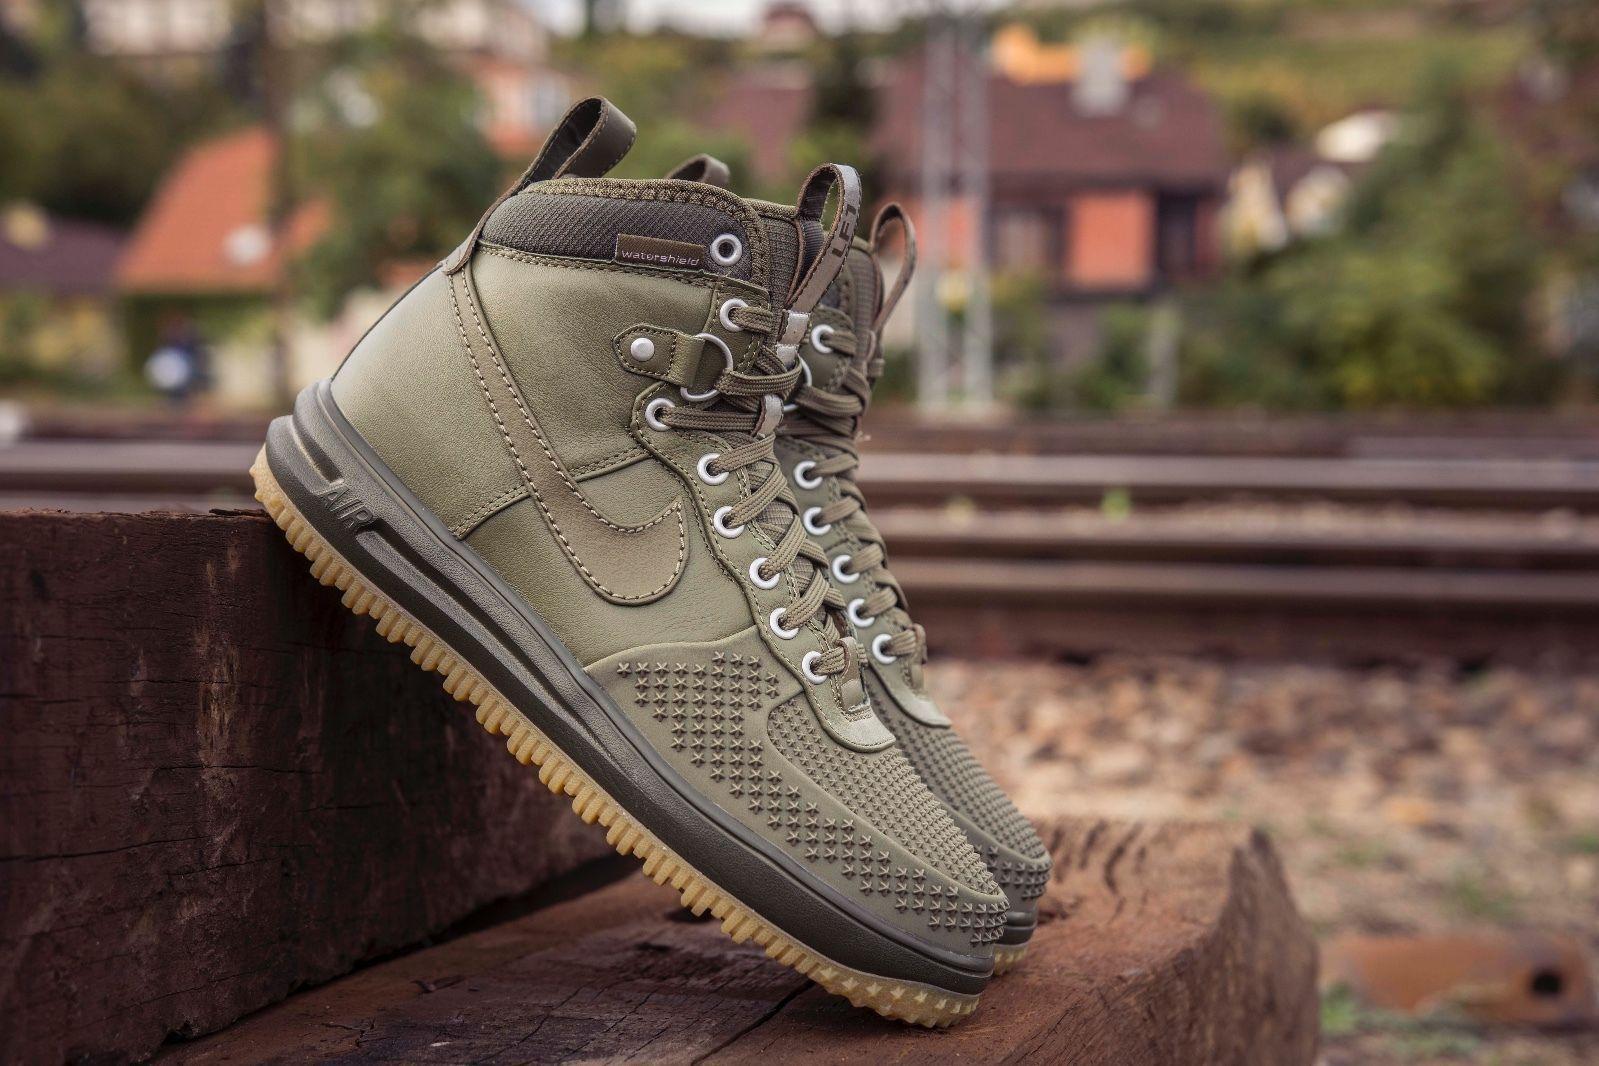 NIKE LUNAR AIR FORCE ONE 1 DUCK BOOT MEDIUM OLIVE GREEN 805899 201  #nikesportswear #